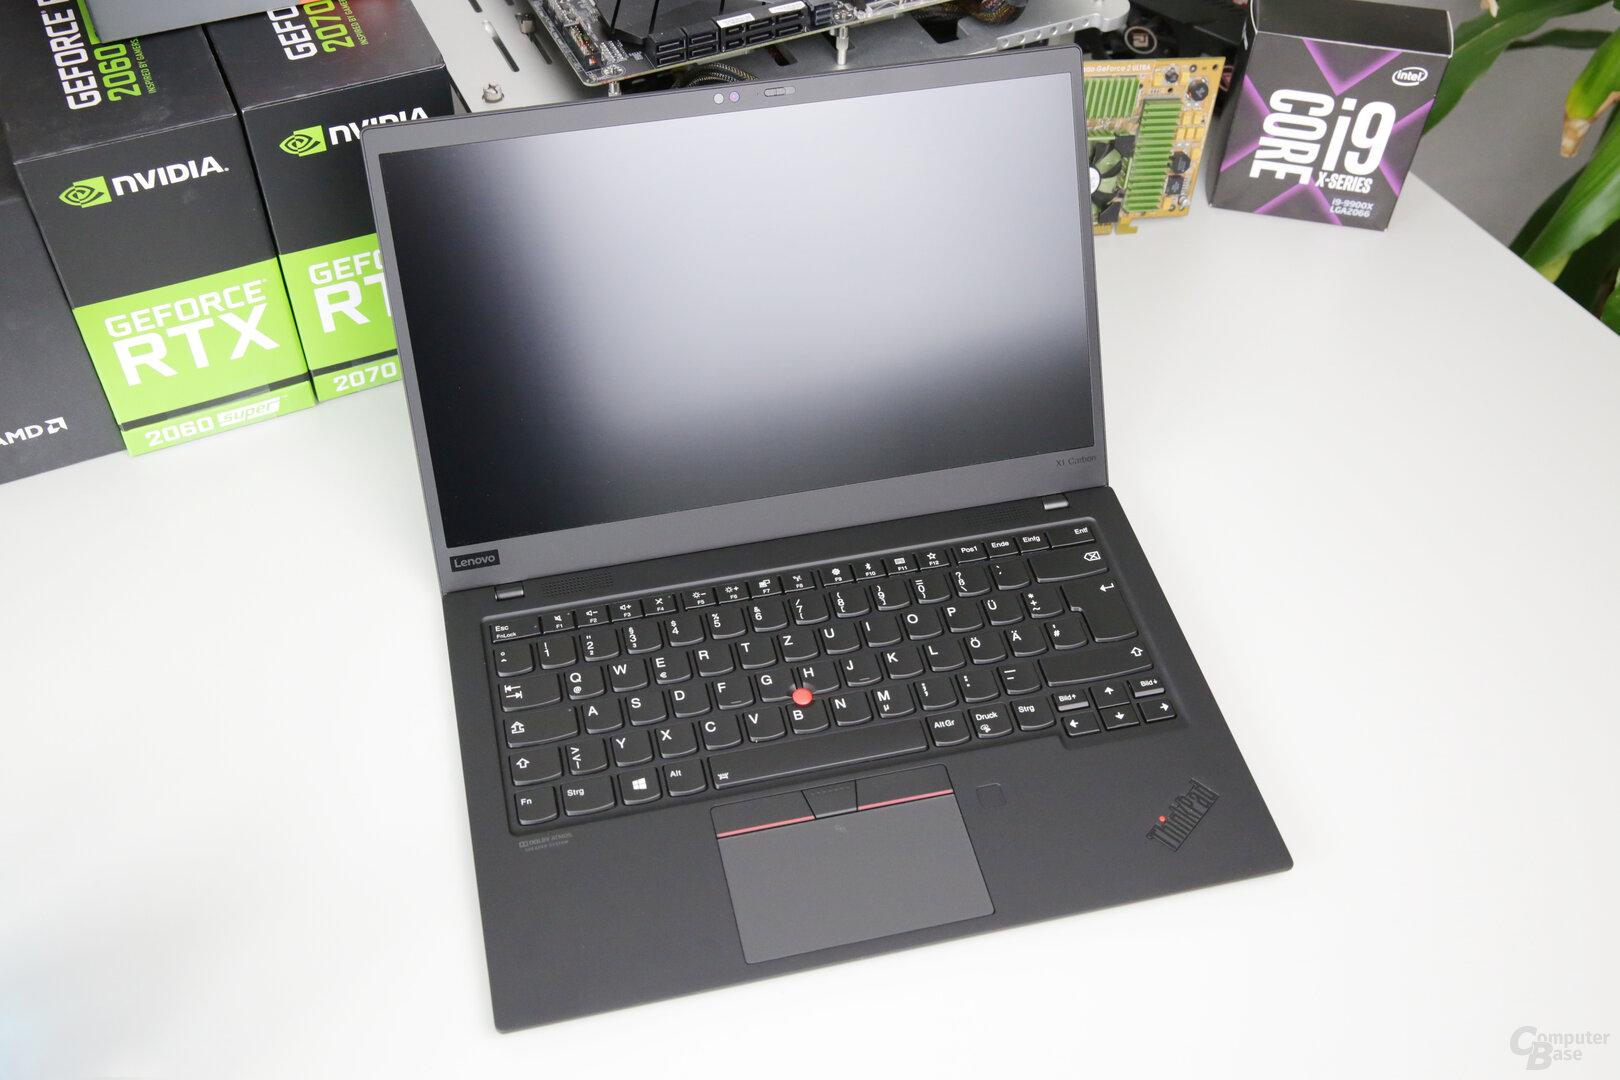 ThinkPad X1 Carbon G7 geöffnet